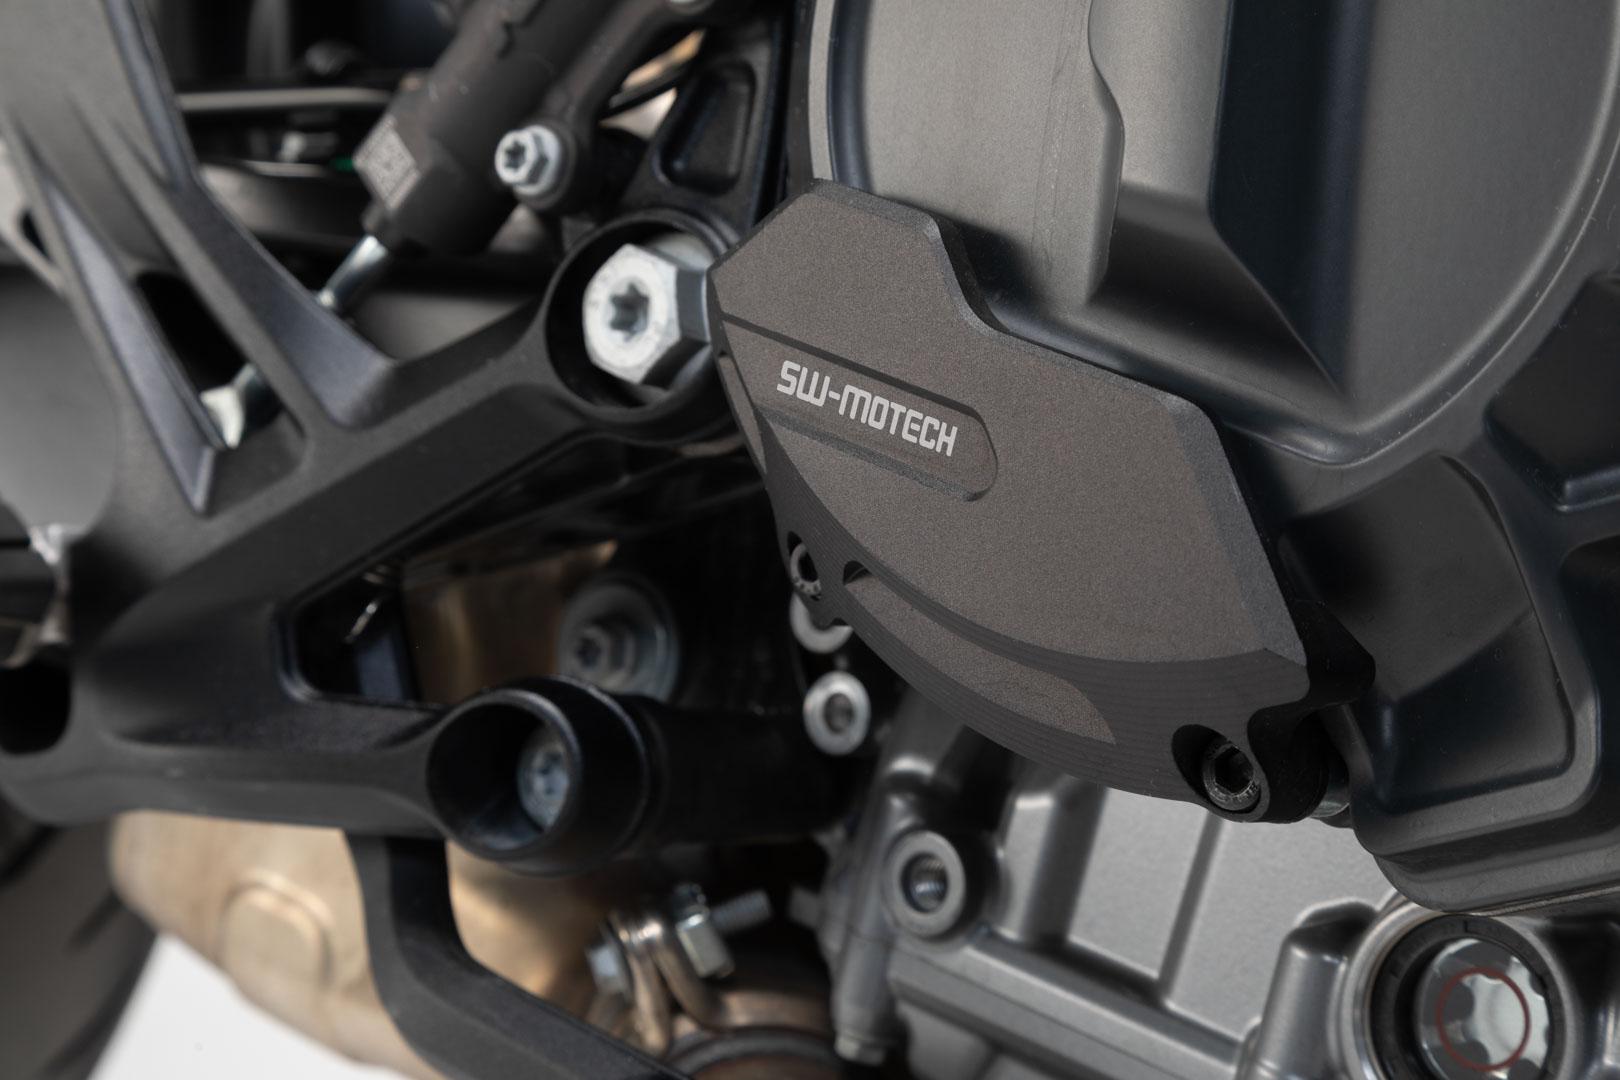 Protector de tapa de la carcasa del motor KTM 790 Duke (18-).